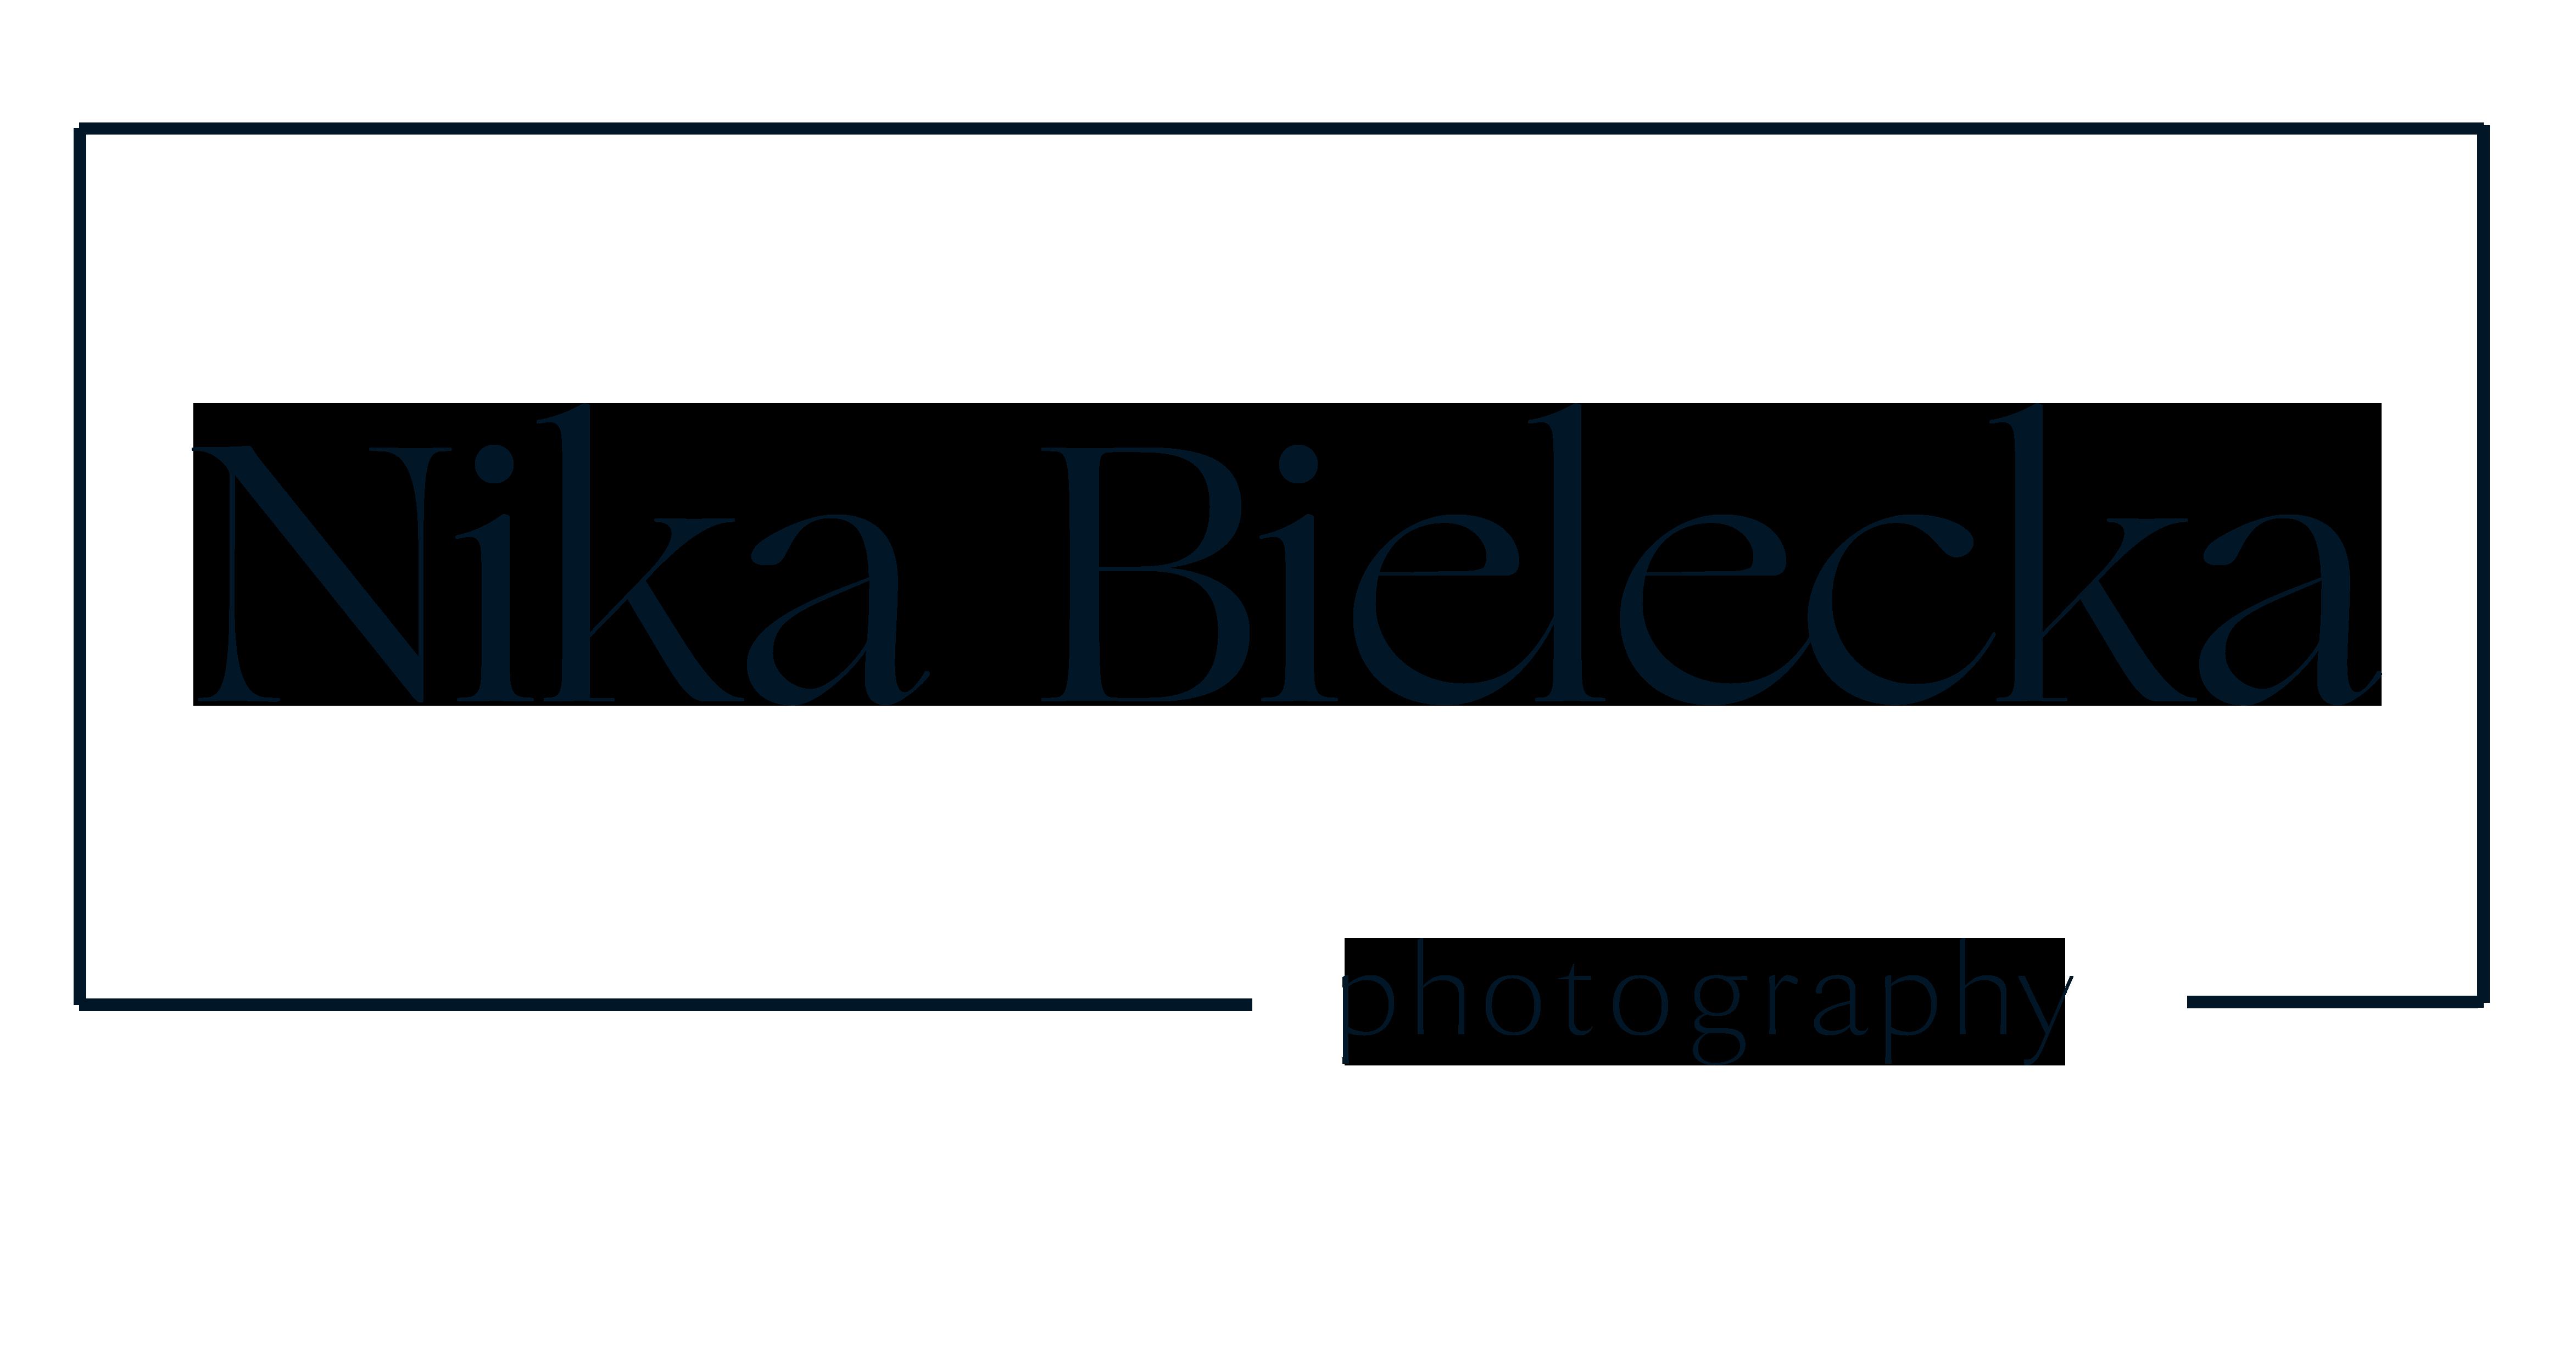 Nika Bielecka